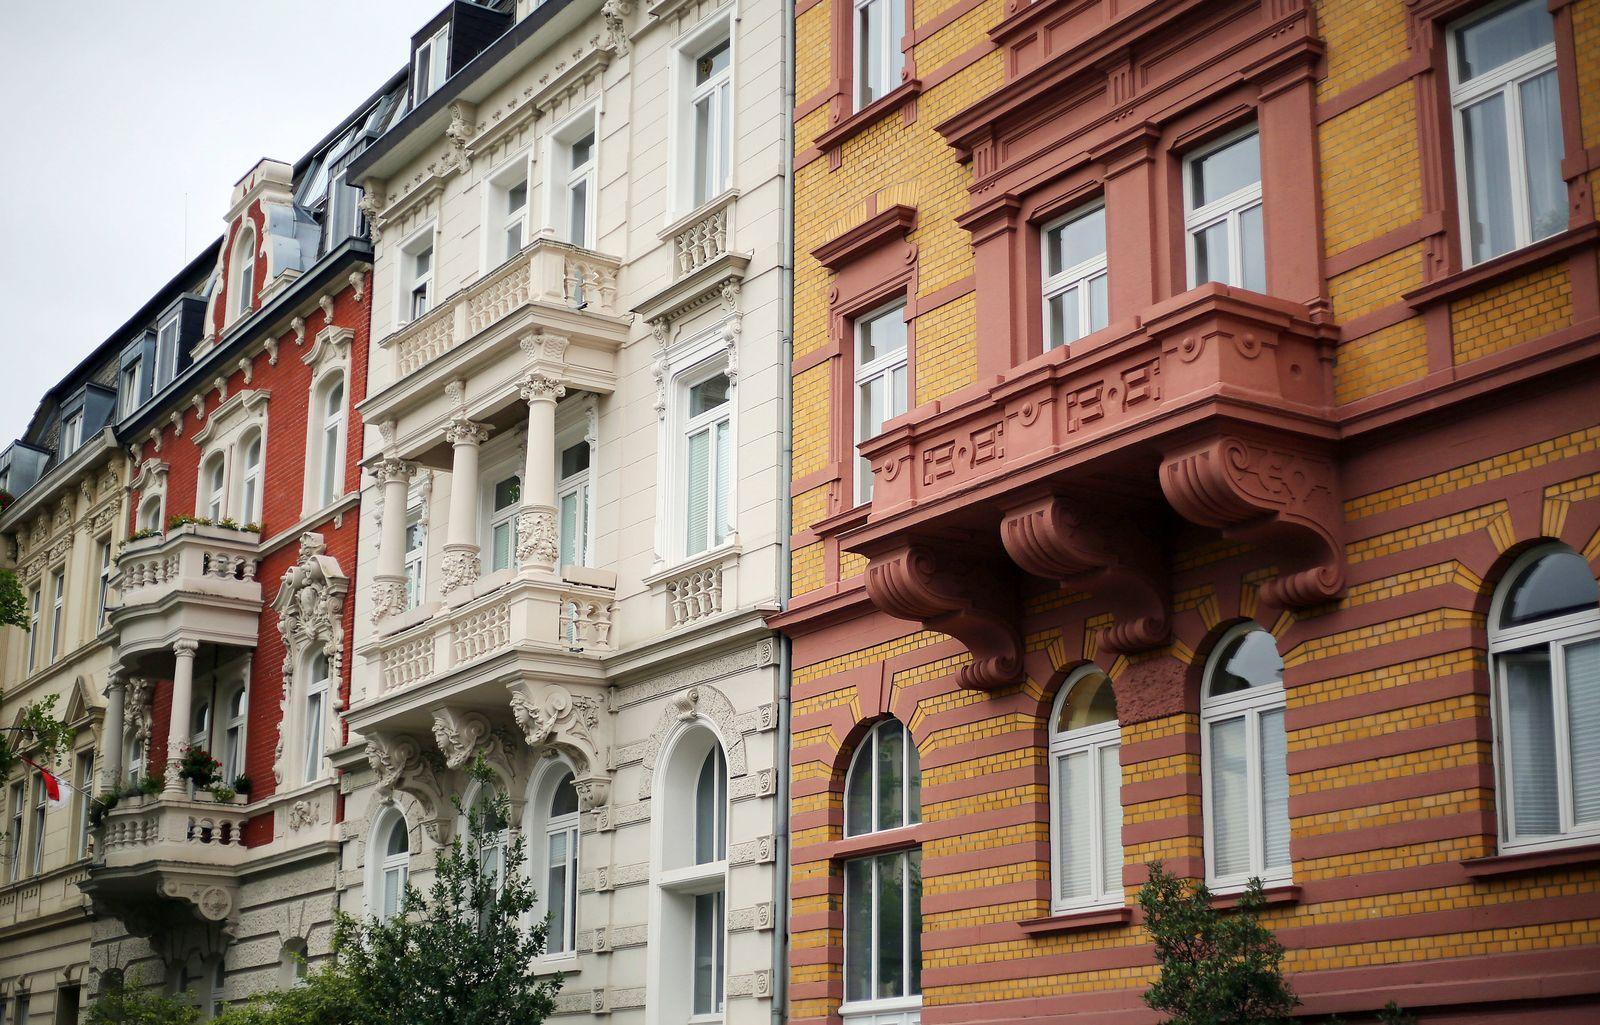 Wohnhäuser in Köln